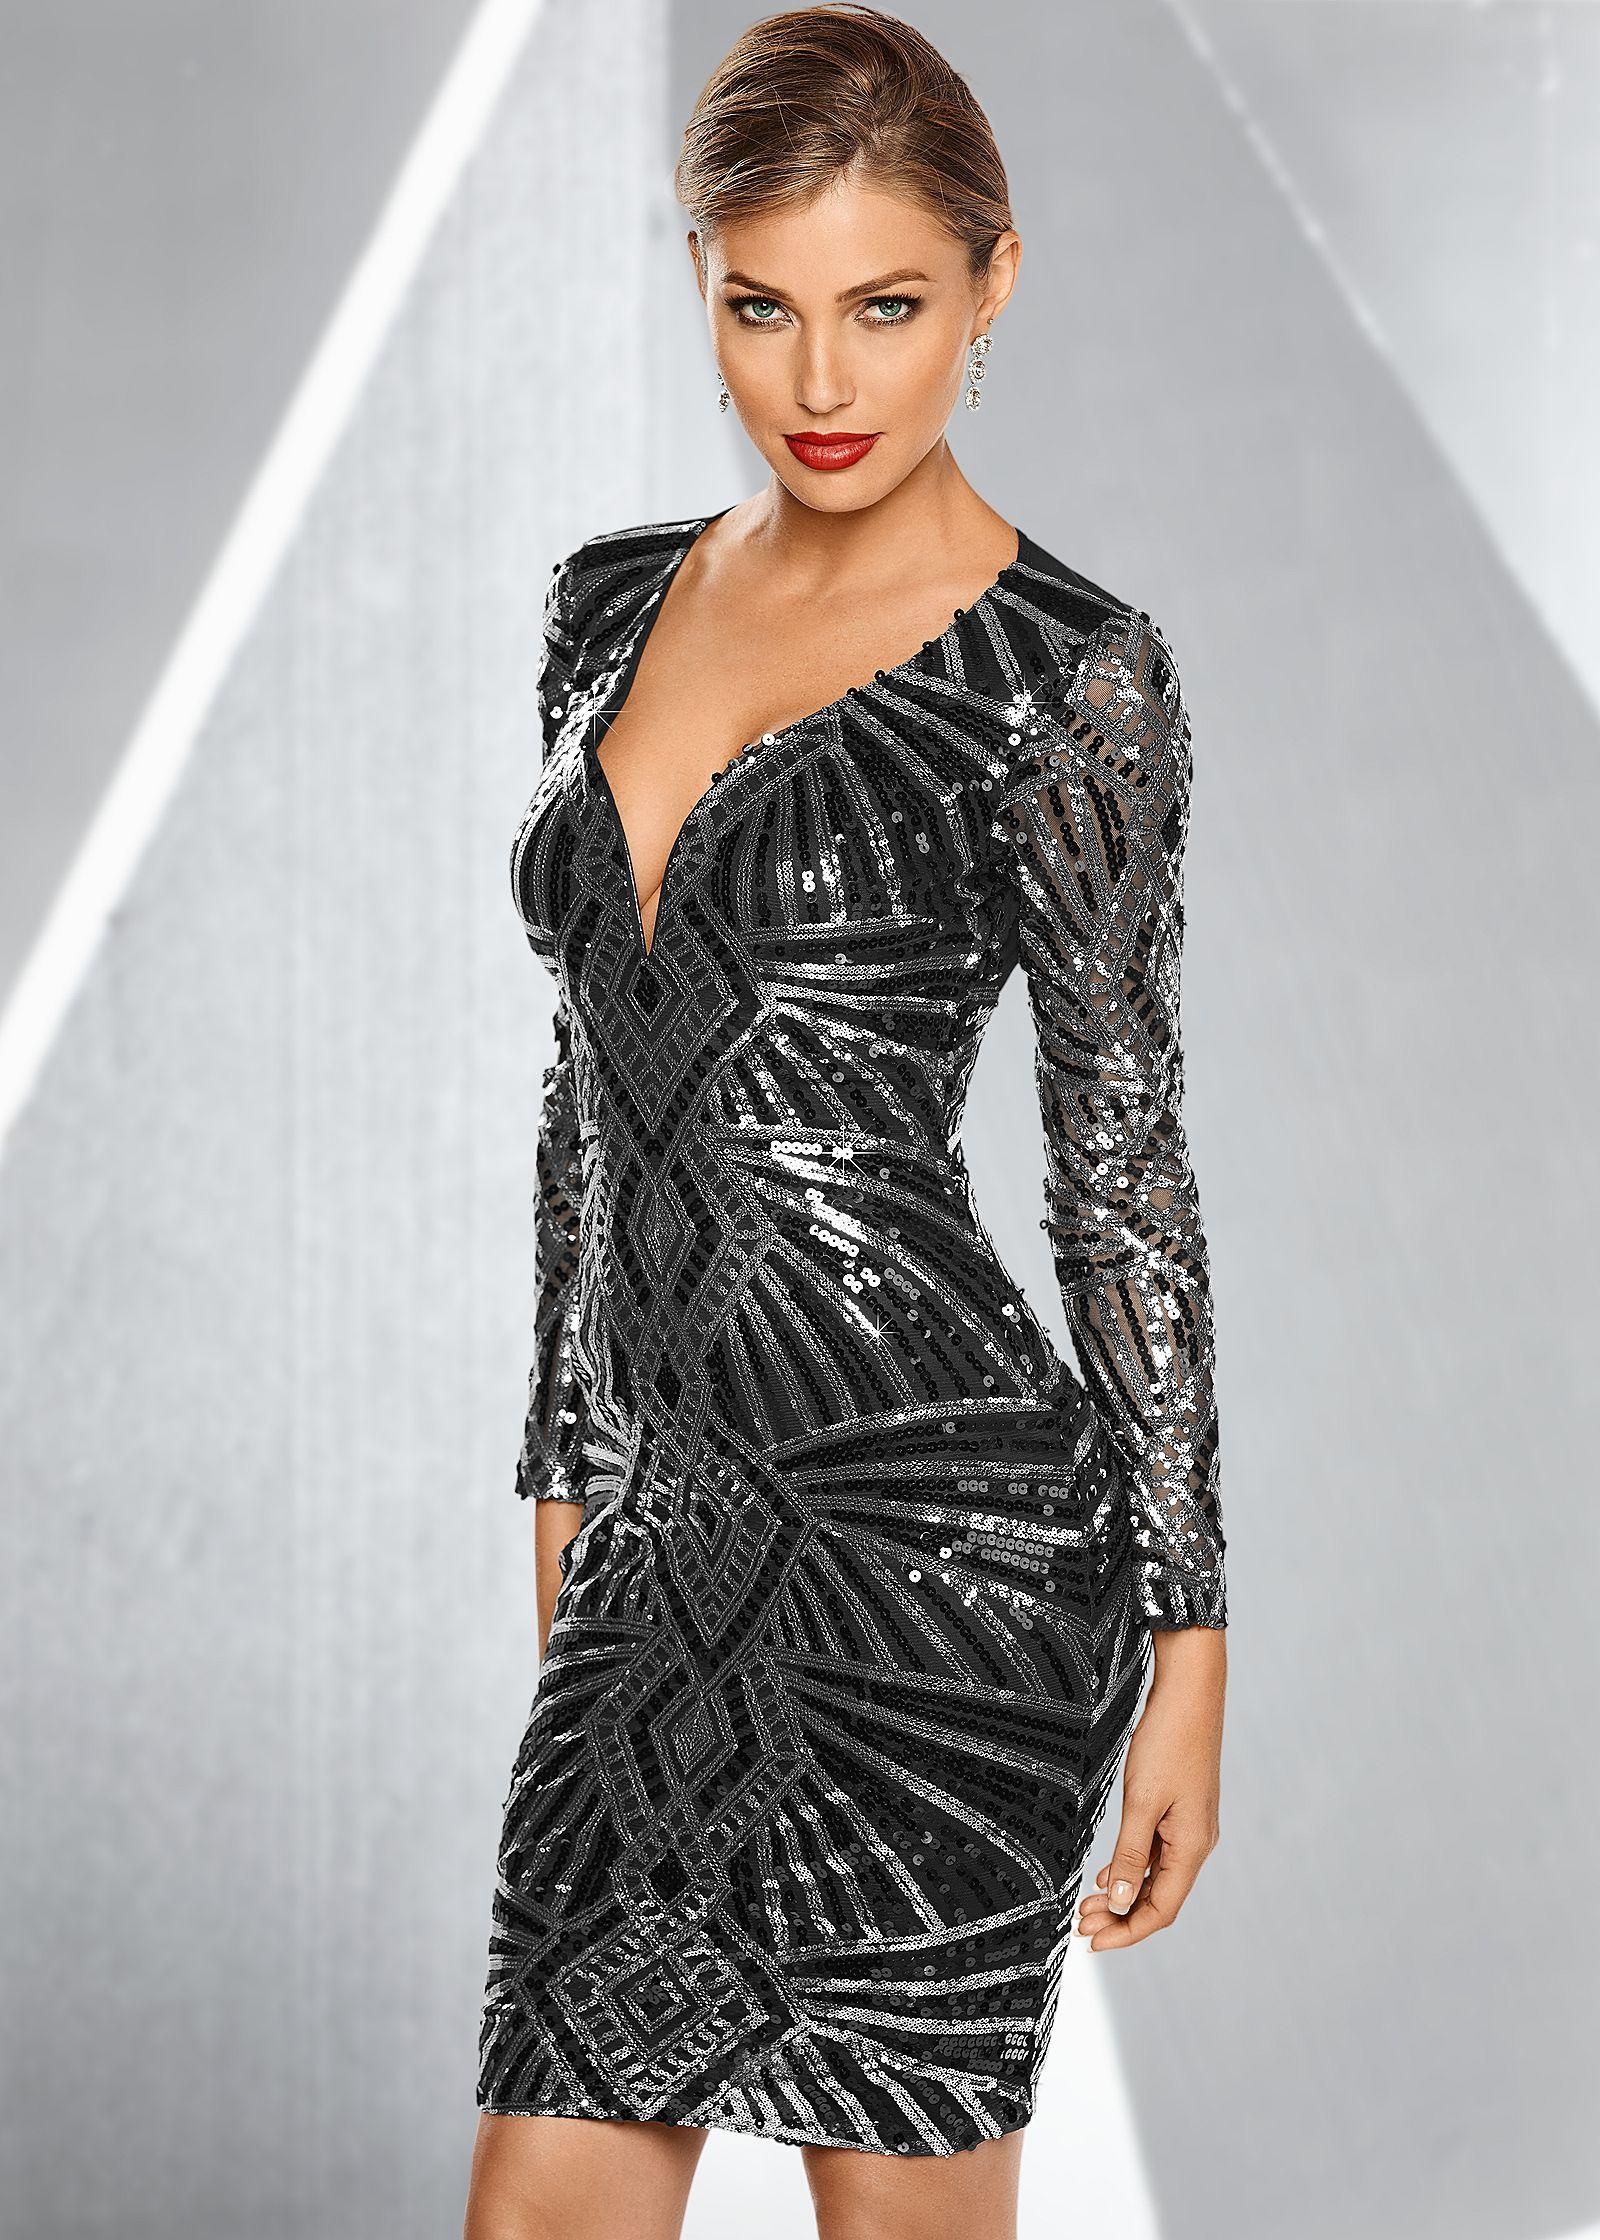 Sequin Party Dresses dhOQK2dA